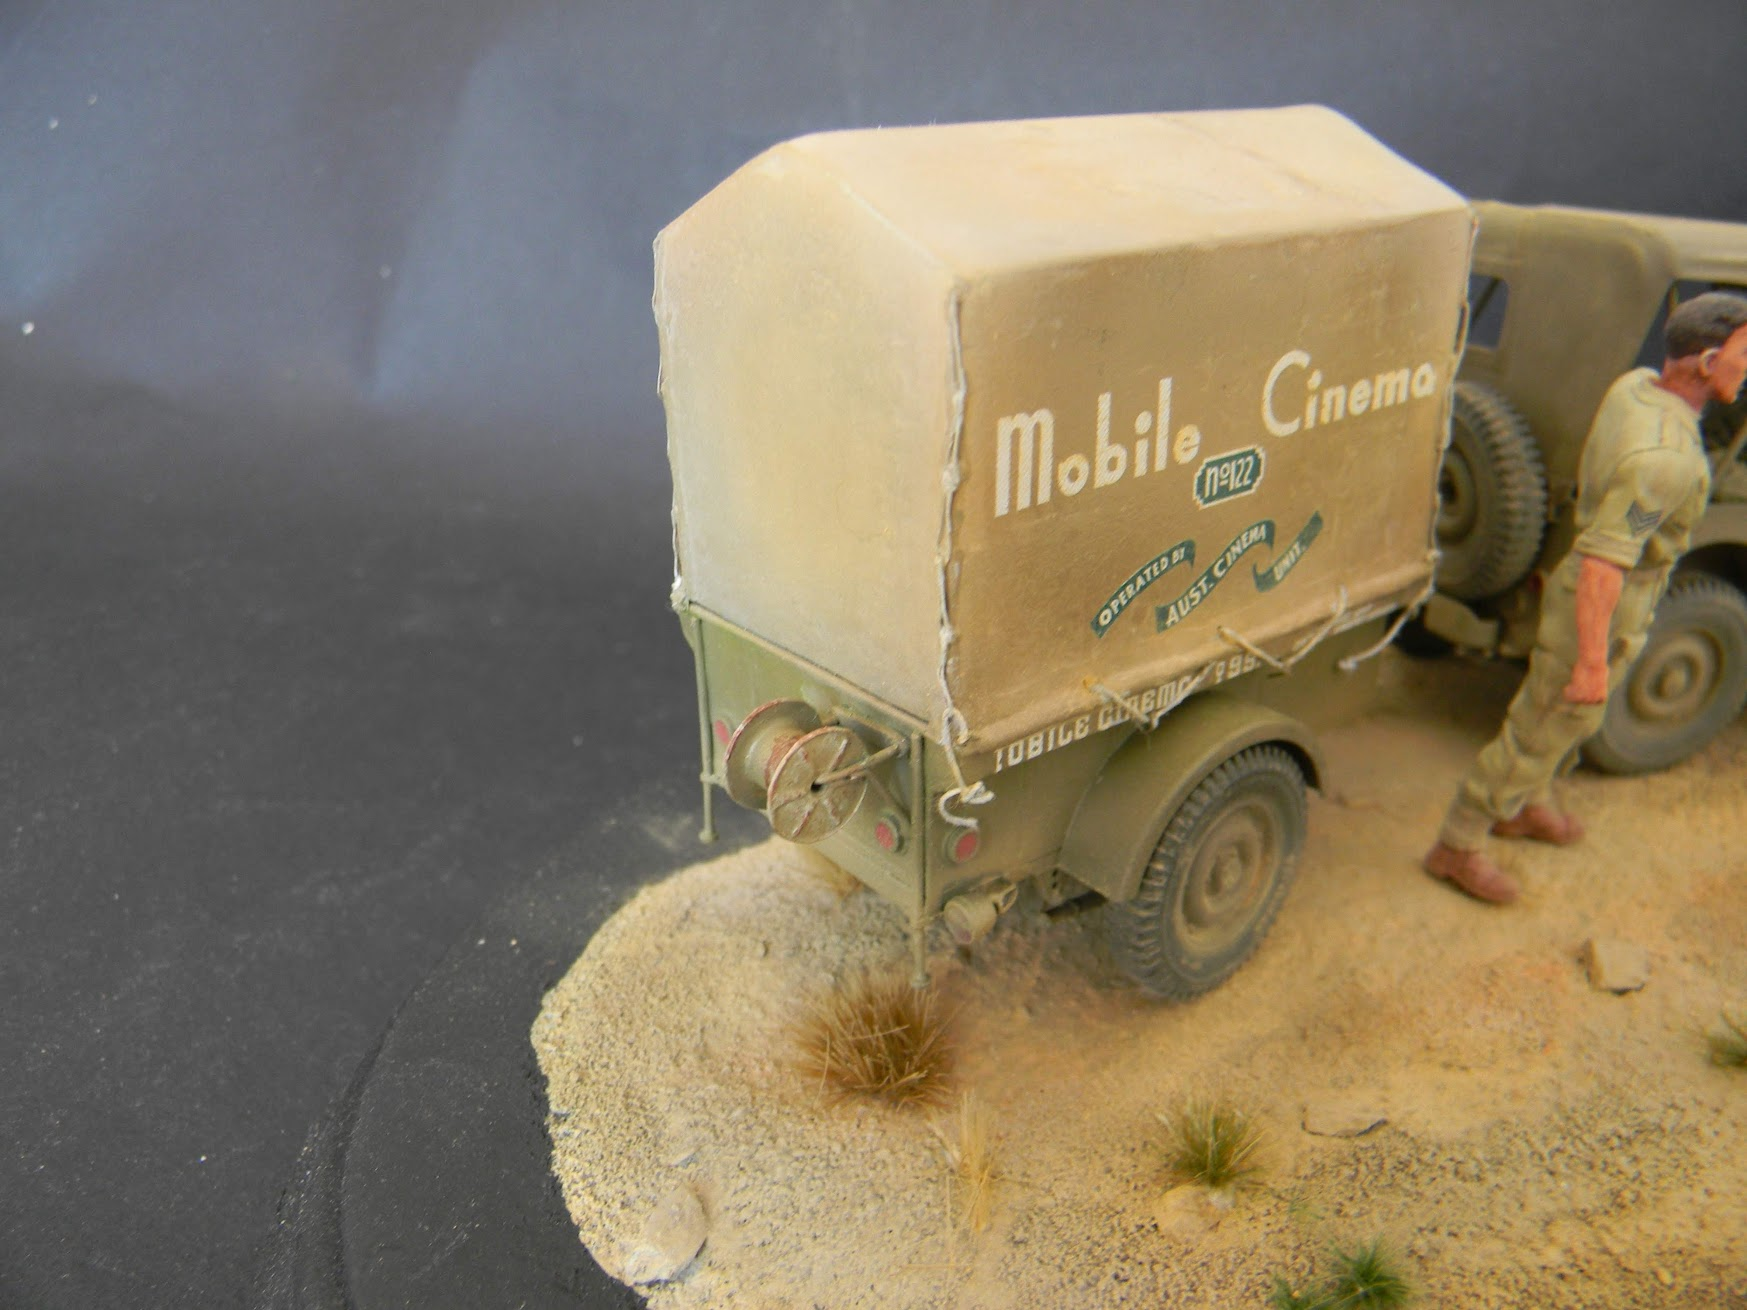 GPW 1942 Ford Bronco Model : revue de détail et montage - Page 6 HfPqPAP9m-W8wedLKfkVurRomjOzQOcVDF5QYa9QB-lexYsw5JYa0RTHJl8-5leMWiuikfQyejQmnhvdyaHjxlZcZ-Dkj2HhF2m-mKzpTS0qrdrK0MJD2Gg7ceBWm7gbddxMEmsf3AW3NZoAsieDAHEfZnhnkWq0k1NvGhvzY8yJeS482fiCG_S1eYEMlftZTtakvOLGtpMloxJi3q24VIyPkV6FqPntE8MBlVkYiYoqjMEu2Z0uWtNJCo9fbd3gJY7UA0cdJ9Tcj_OIoOFDgQKjIp_-JJUxif4nJ47WJP4W1d_8Iez_kzTWxjPFn_j64Ste7KgHHm7cintD8aU-IqCCaLESjSCzfVuQvdaHeJFBMe05TWOTa-nTckdqiA4NdZbwTT6aU5JNdShffkd_ehs6i5eySjpk_kj7aH3ZoSKVEfEeptkUJZIu_-ILUcBwkD6TE5XuICpkLfzQff1HUXQkJ8k-clNzQe6hepnsbBLItJ5yh-mMQKjPX9-RRv5o-i22qw0JjrEWLQsJExK9lgspvsZ5JoCFwLlOtUGevqZGJcj9vNeX2xzO_0cjTMp5-6OMtj_-ApdGZFSEUnN19OPvztdII-wXvb9AA1_IS5bBk5DOEuUUdFaz7Fcbd1OtT8n7lt2noi1emU6DyxhhH-ZzPVaU-n7IMmEBPSmh8FU406l8sqSVhm1PUt2e8BDTAipiEM0Y_M2gI36AE_kTuNcbIyiBa-xT8tSrIZZJ5RsREnXOP9YEwZut=w1747-h1310-no